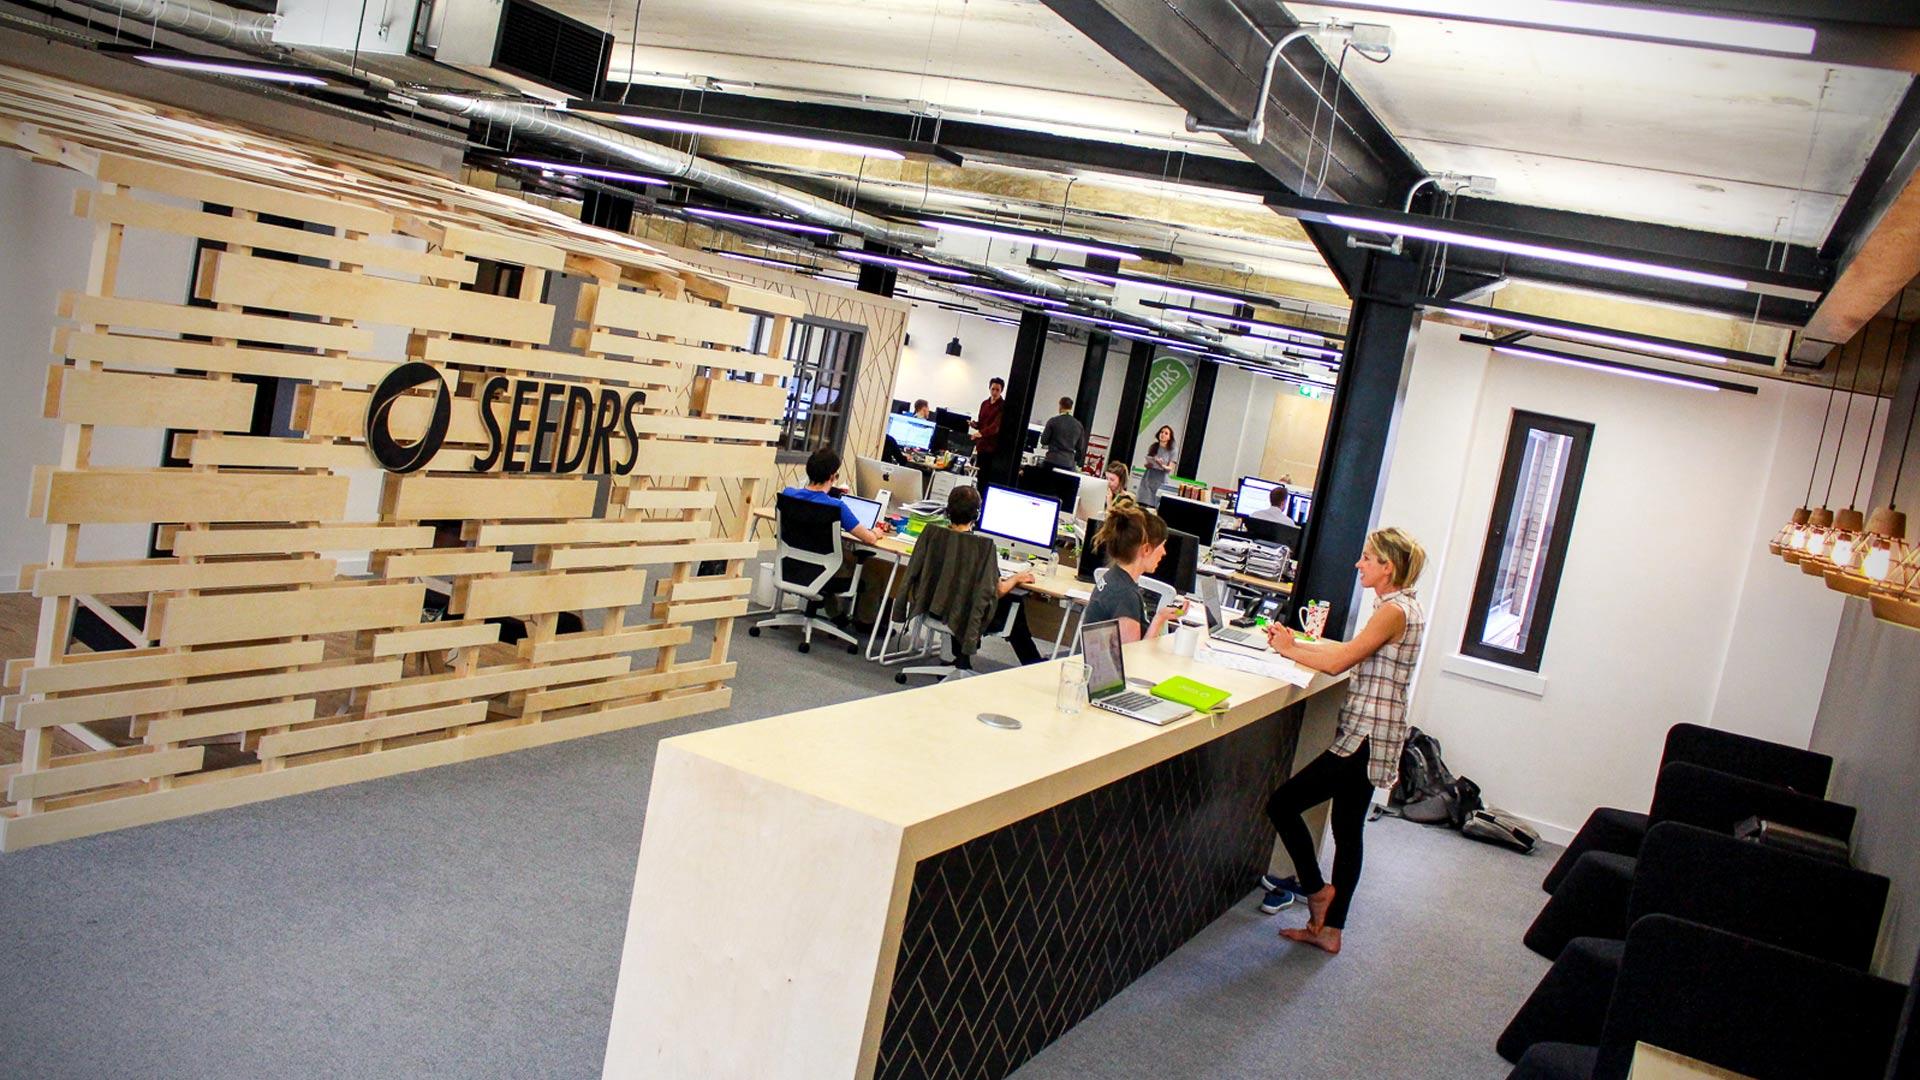 seedrs-office-design hot desk area.